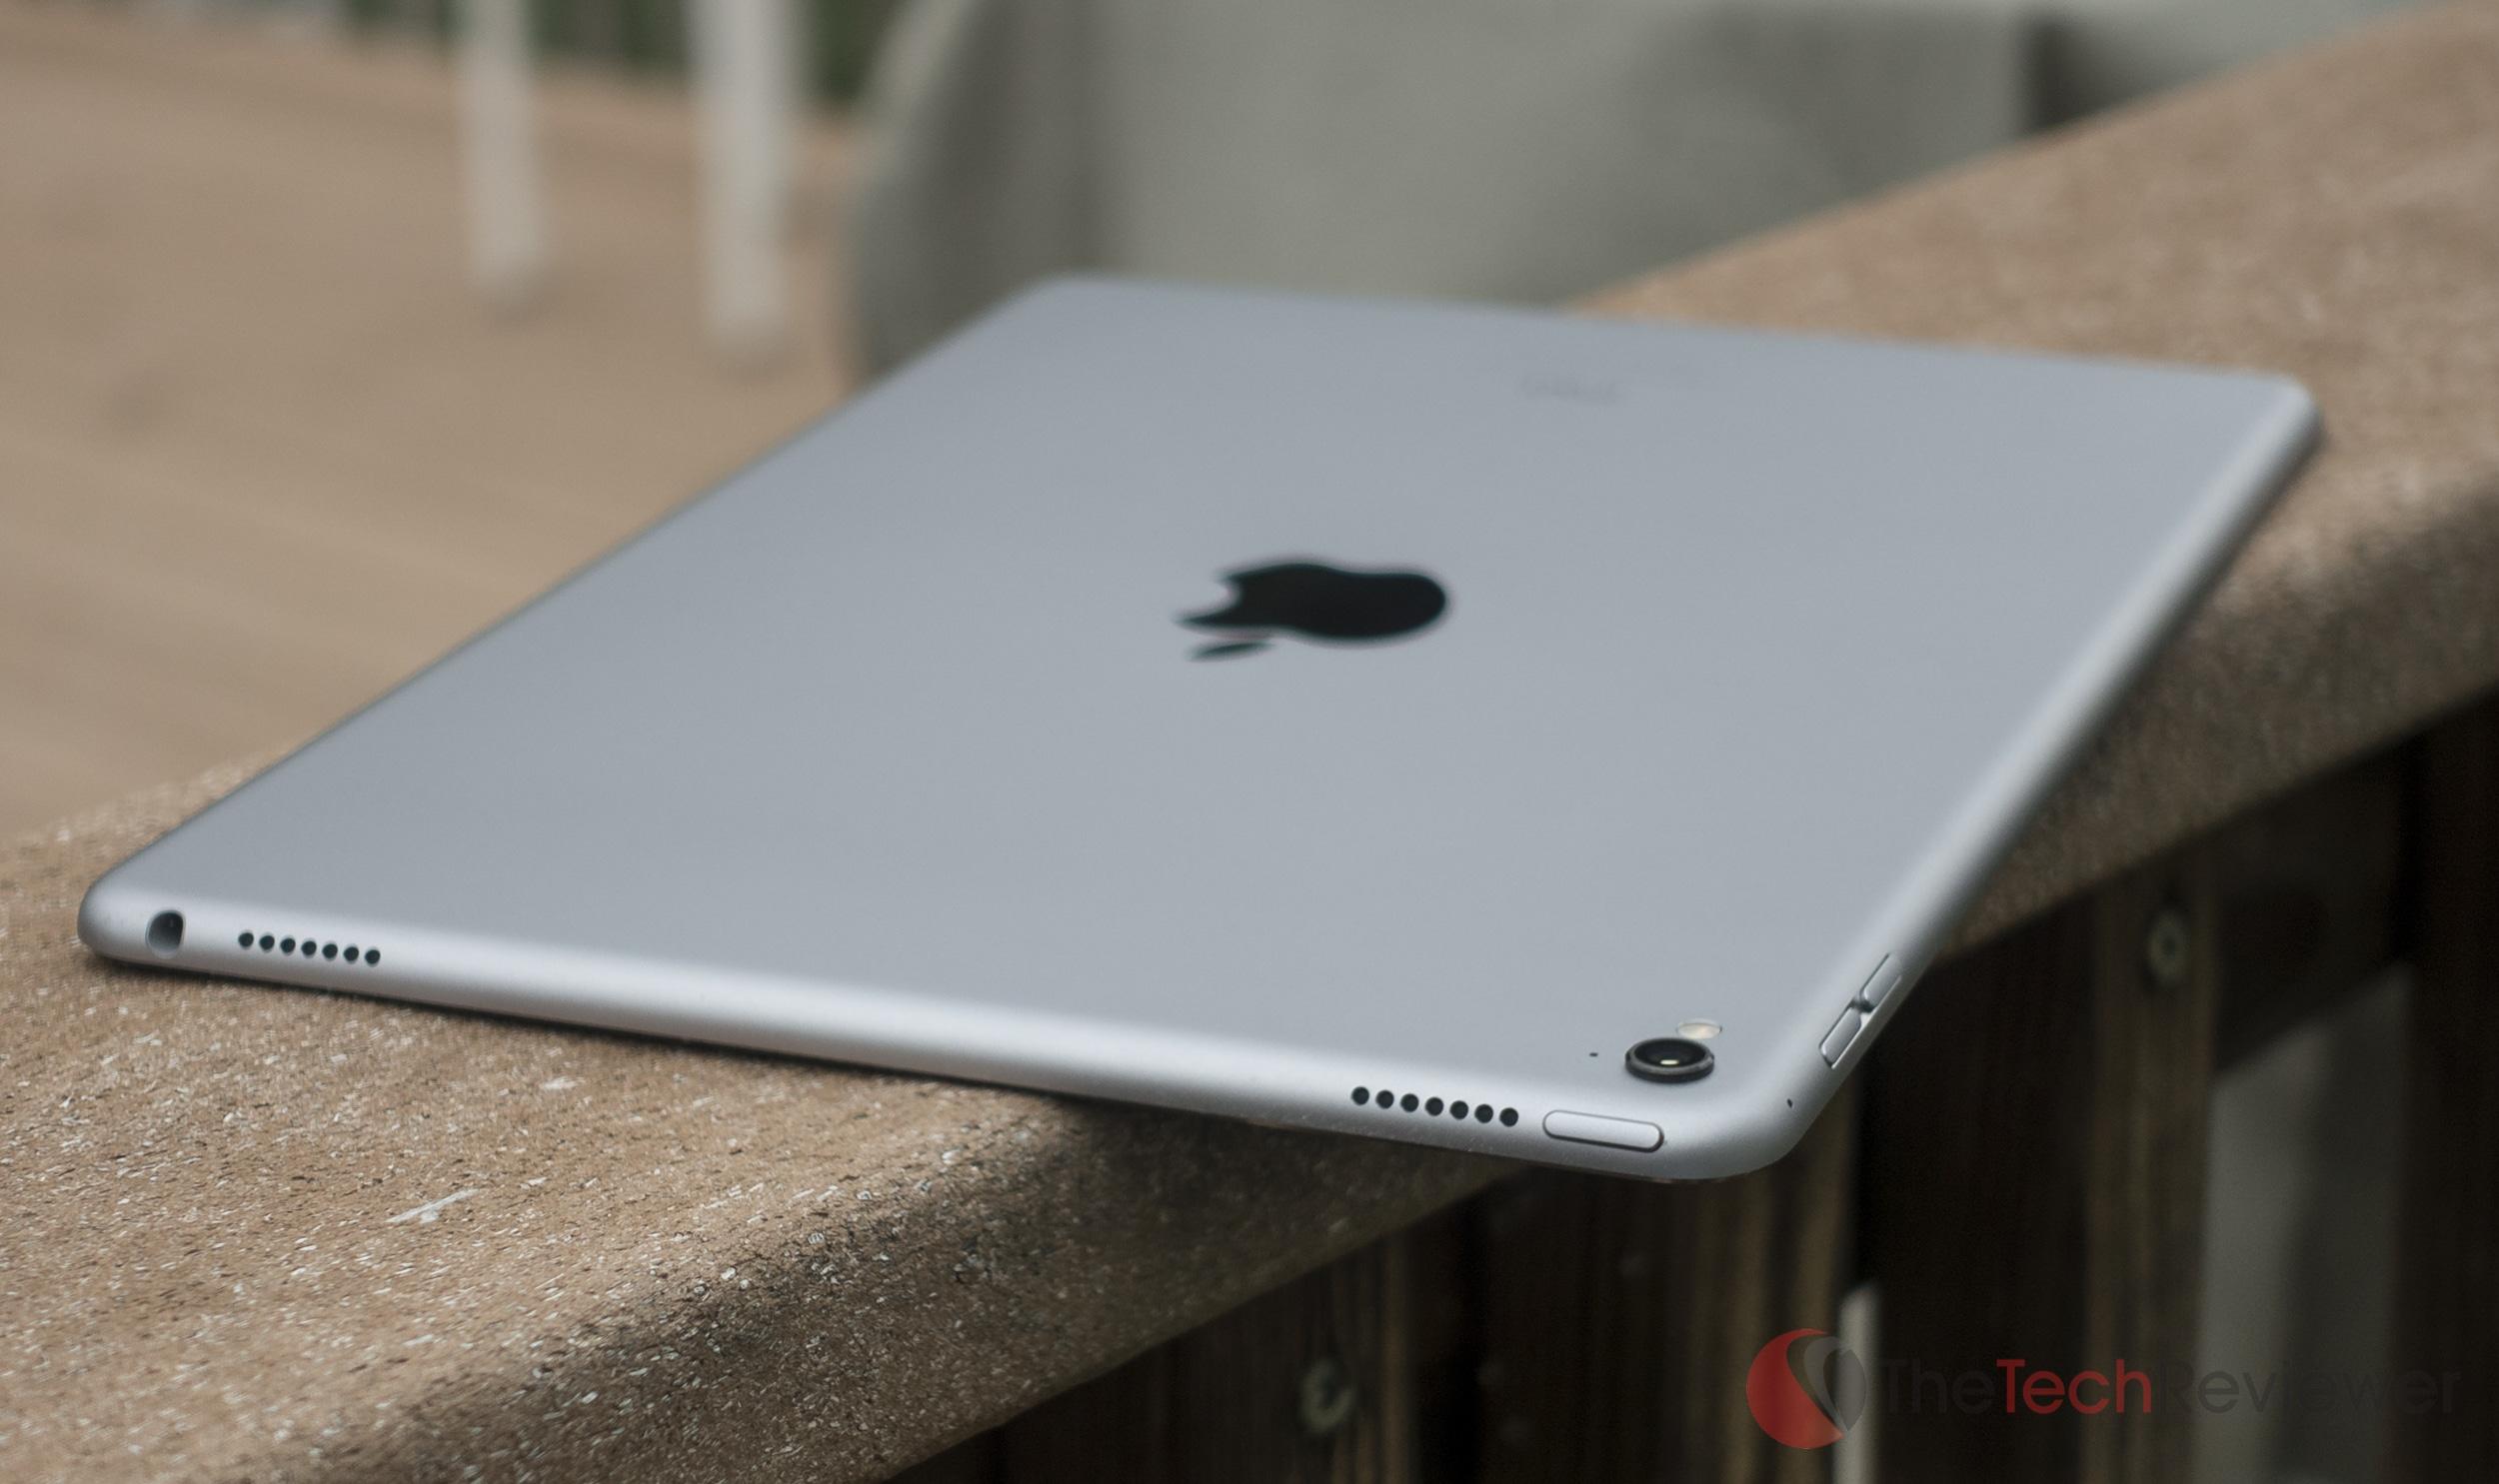 Apple%20iPad%20Pro%209.7-inch-3